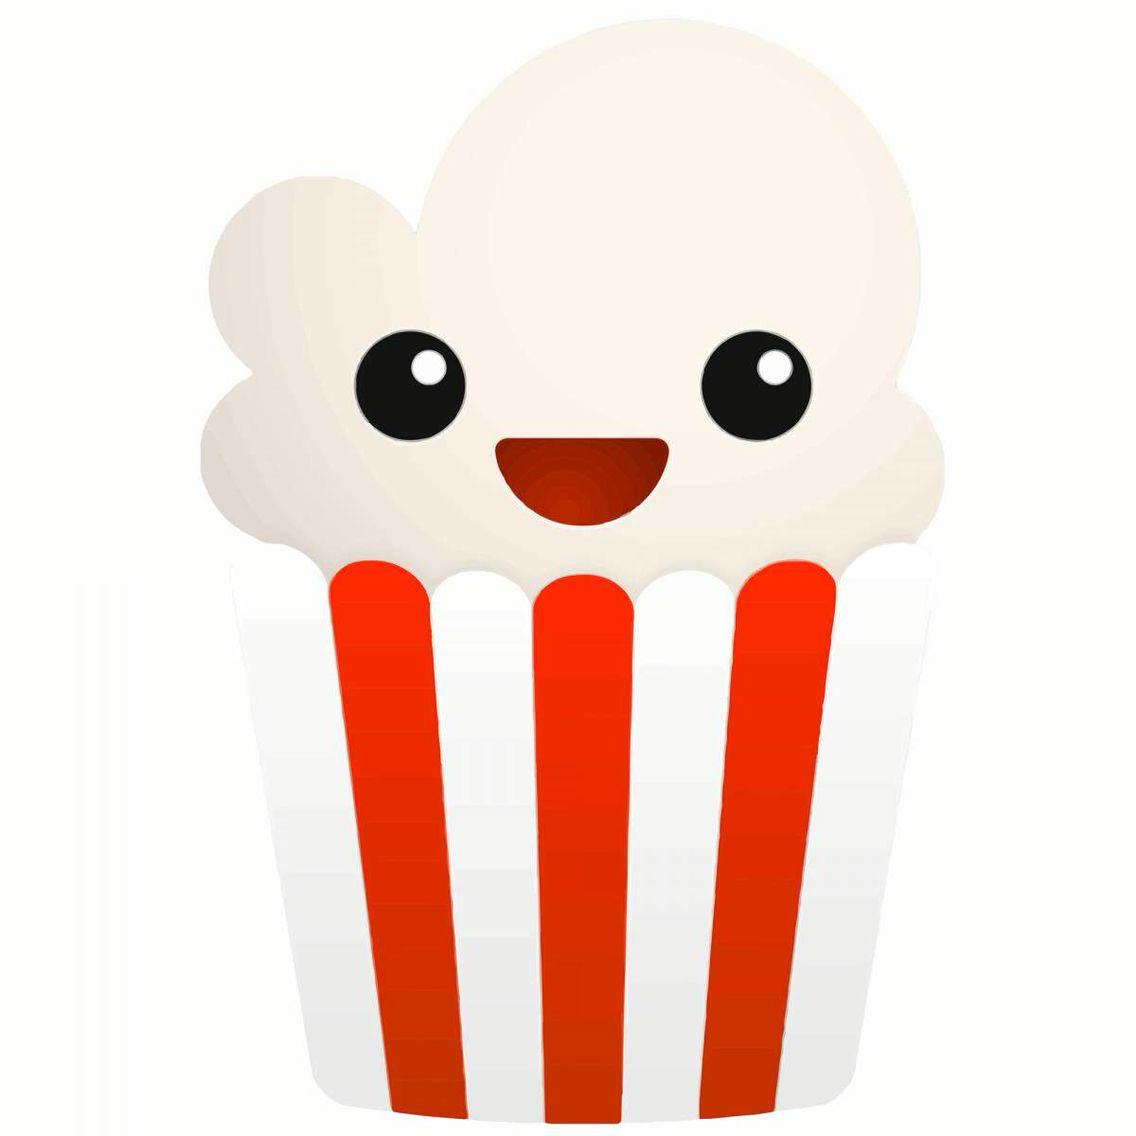 Popcorn Popcorn times, Popcorn, Time icon